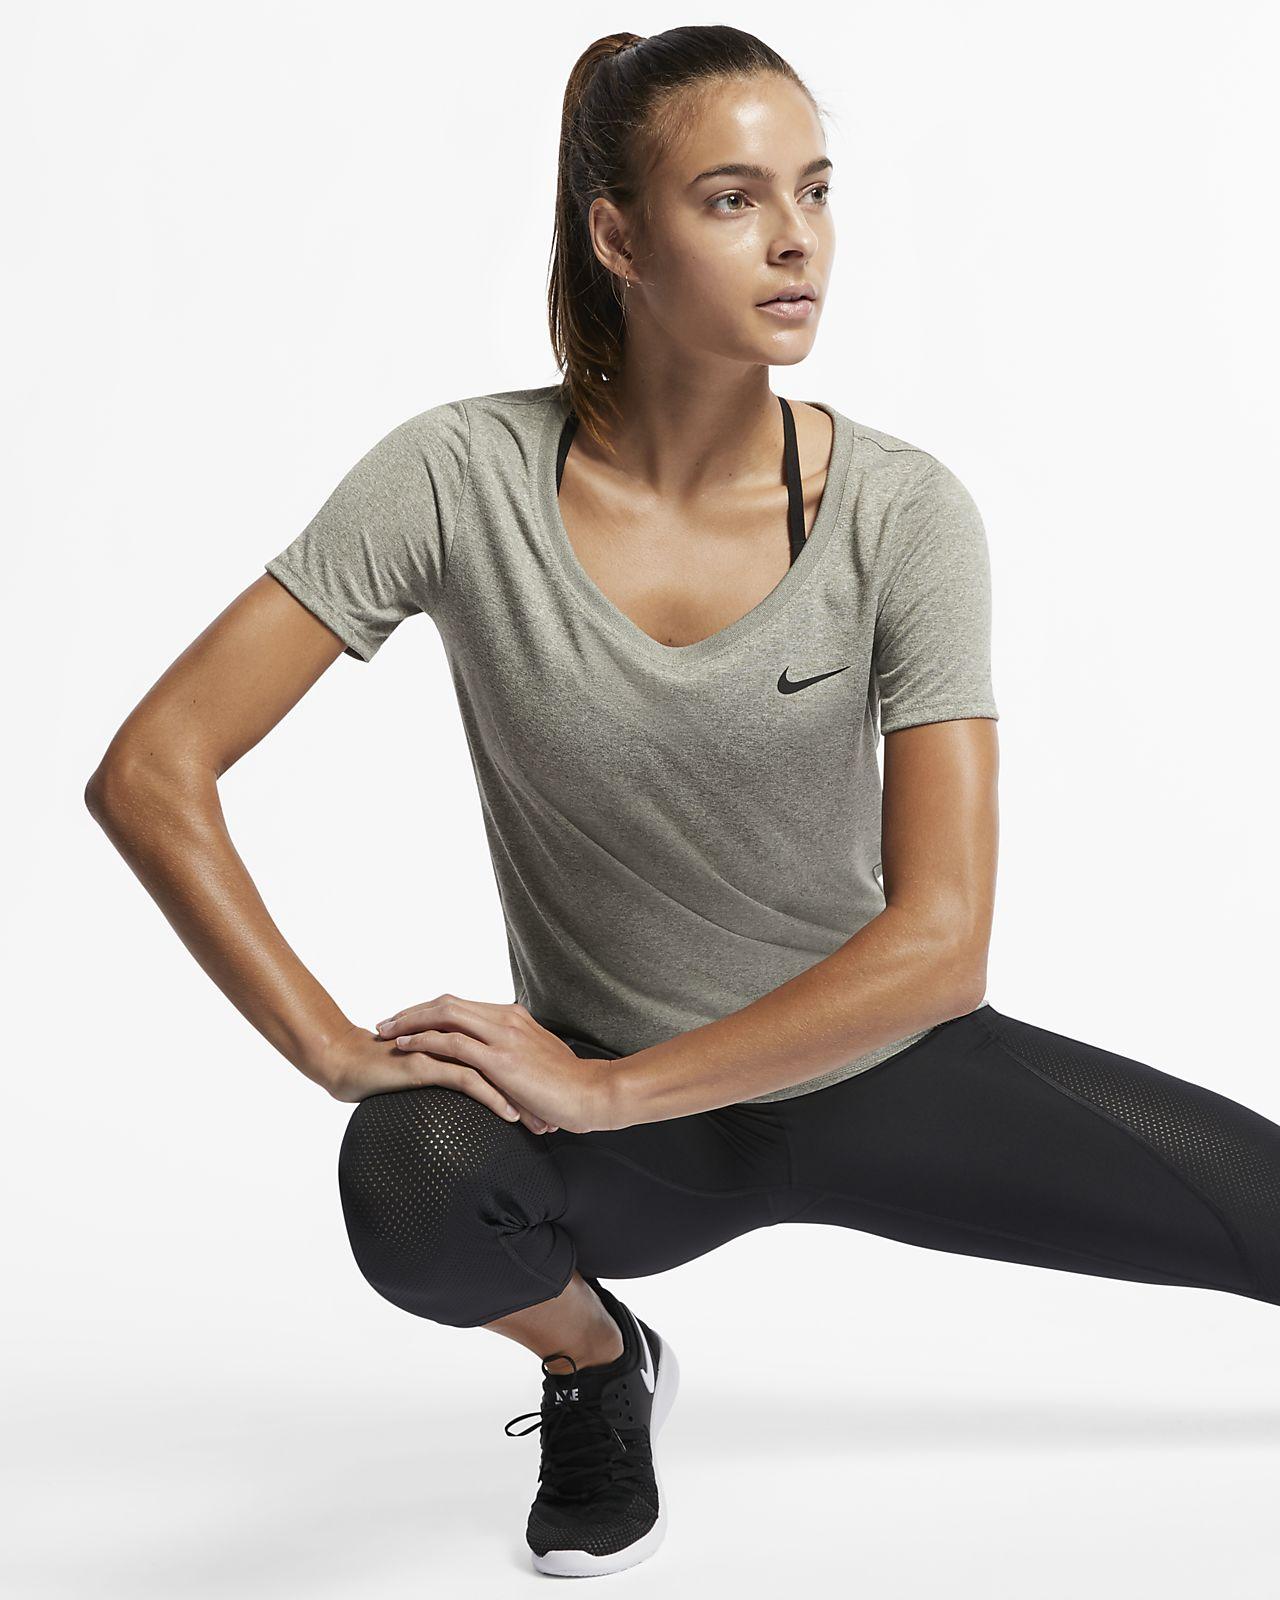 82da4da3133d4a Nike Dri-FIT Women s Training T-Shirt. Nike.com